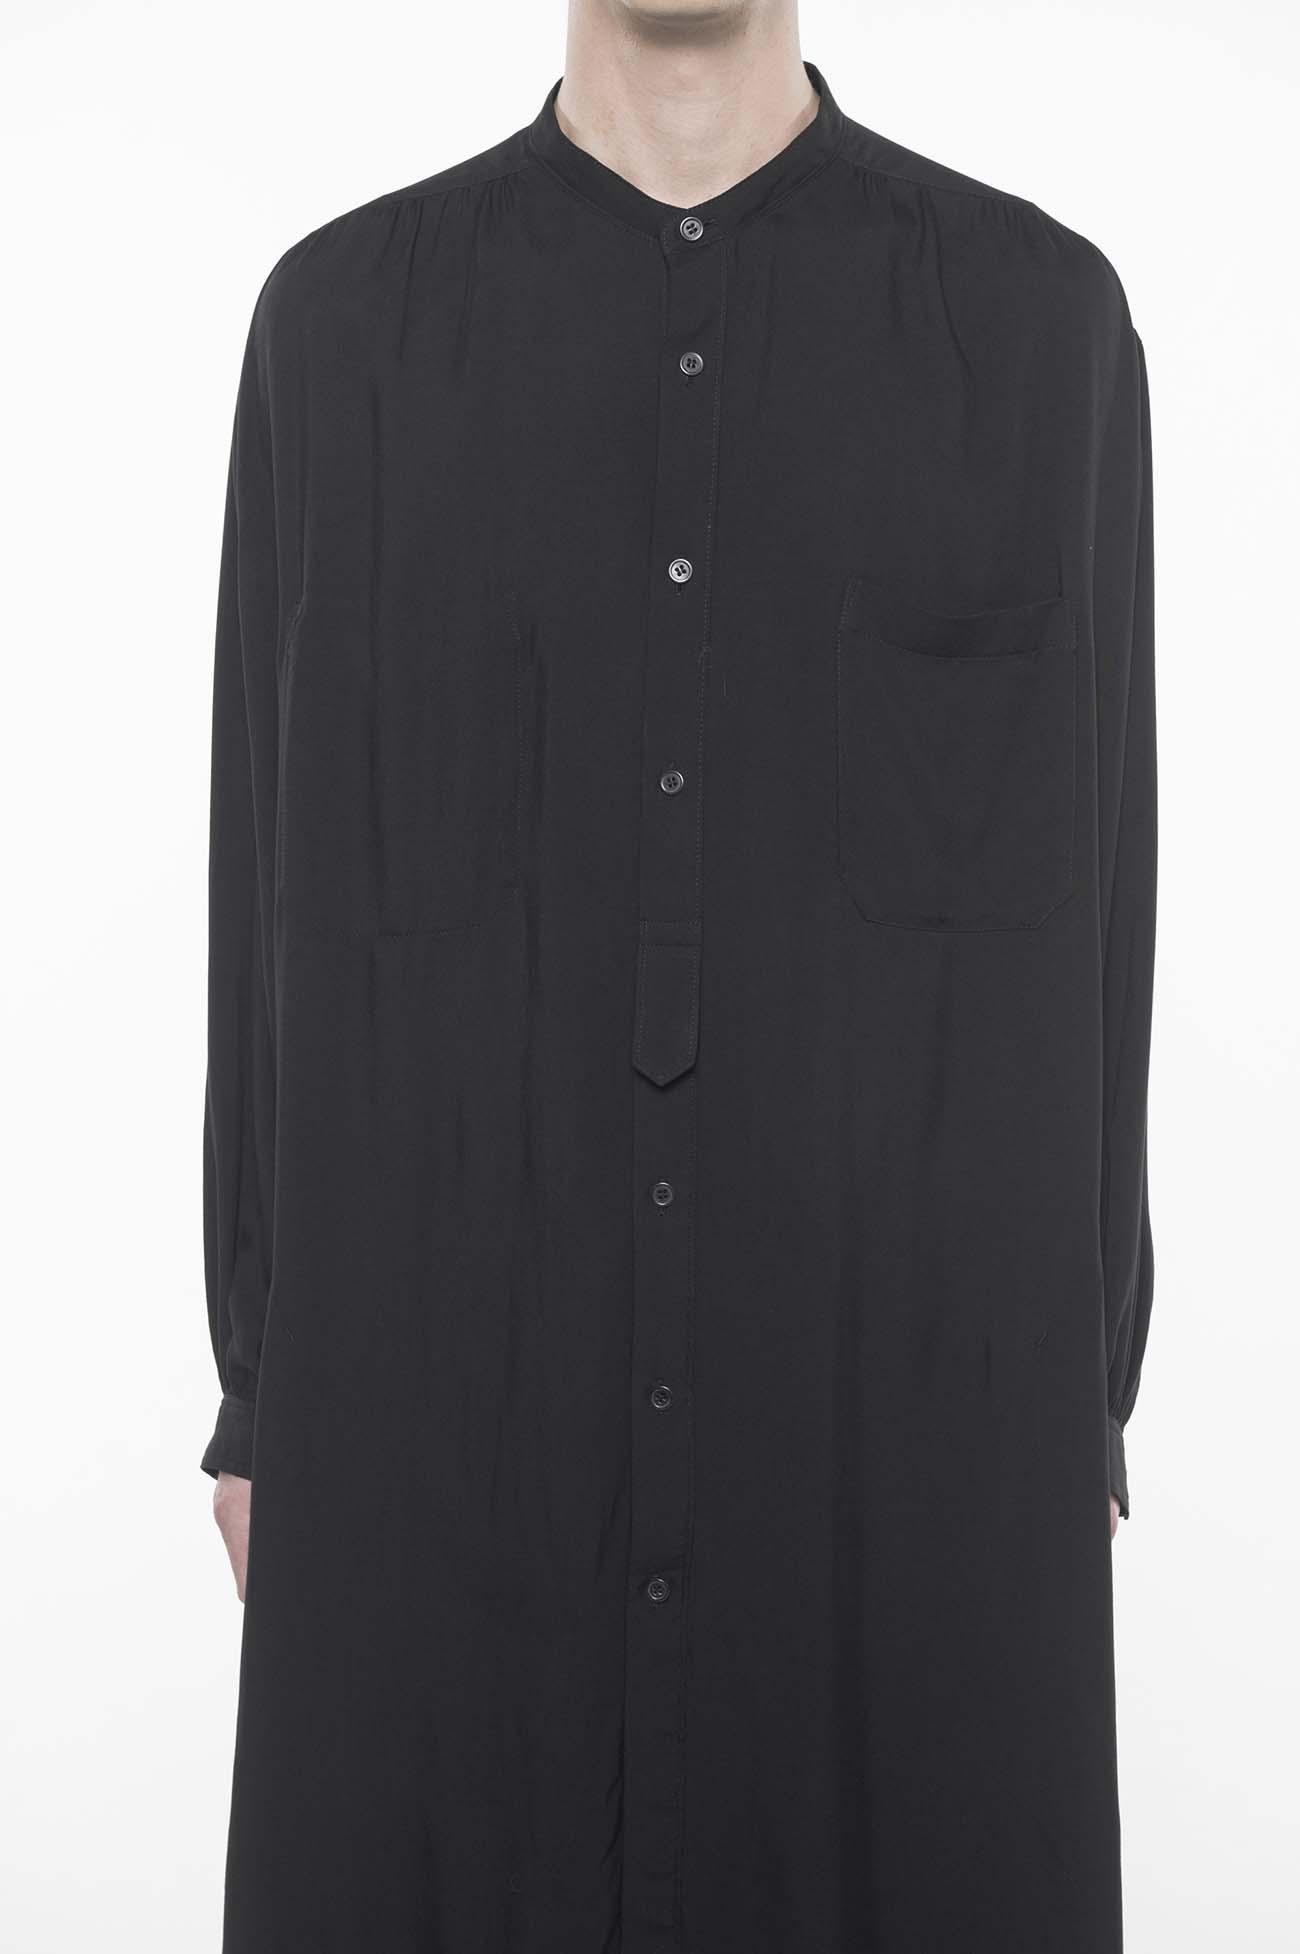 60s Ry/Span Twill Washer Stripe Back Stand Gather Big Long Shirt